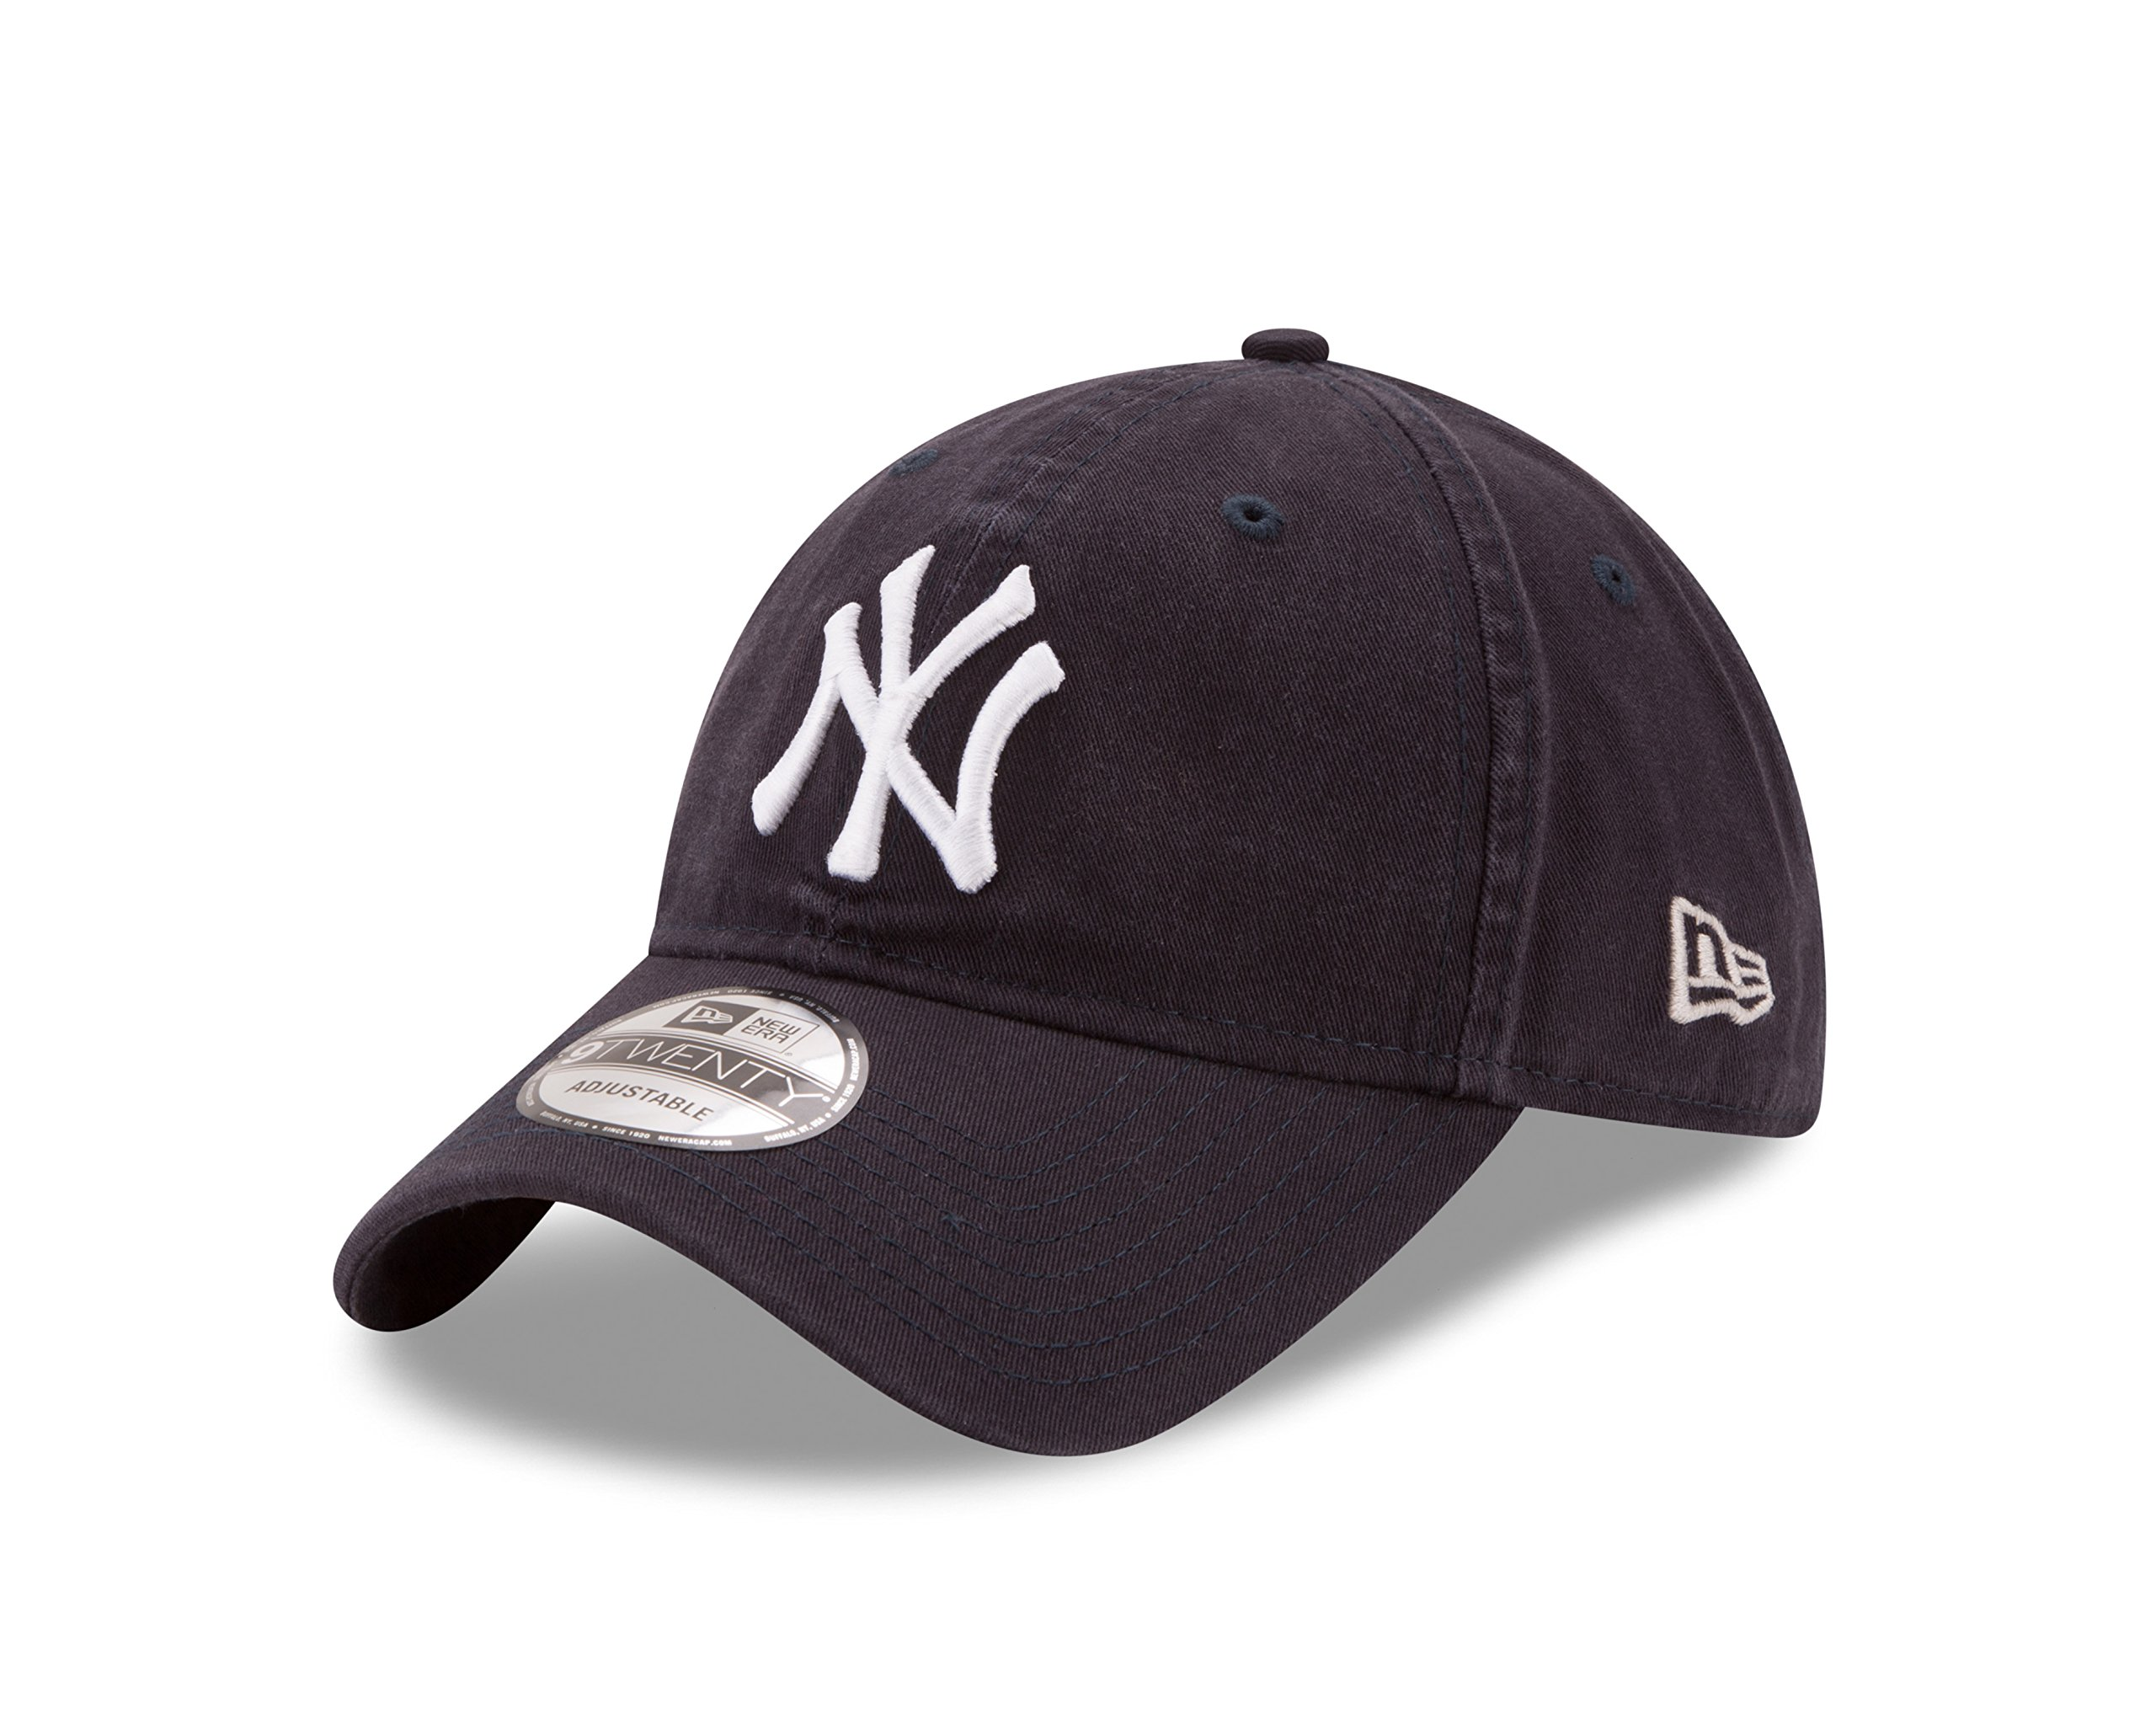 New Era New York Yankees MLB Core Classic 9TWENTY Adjustable Cap Navy by New Era (Image #1)